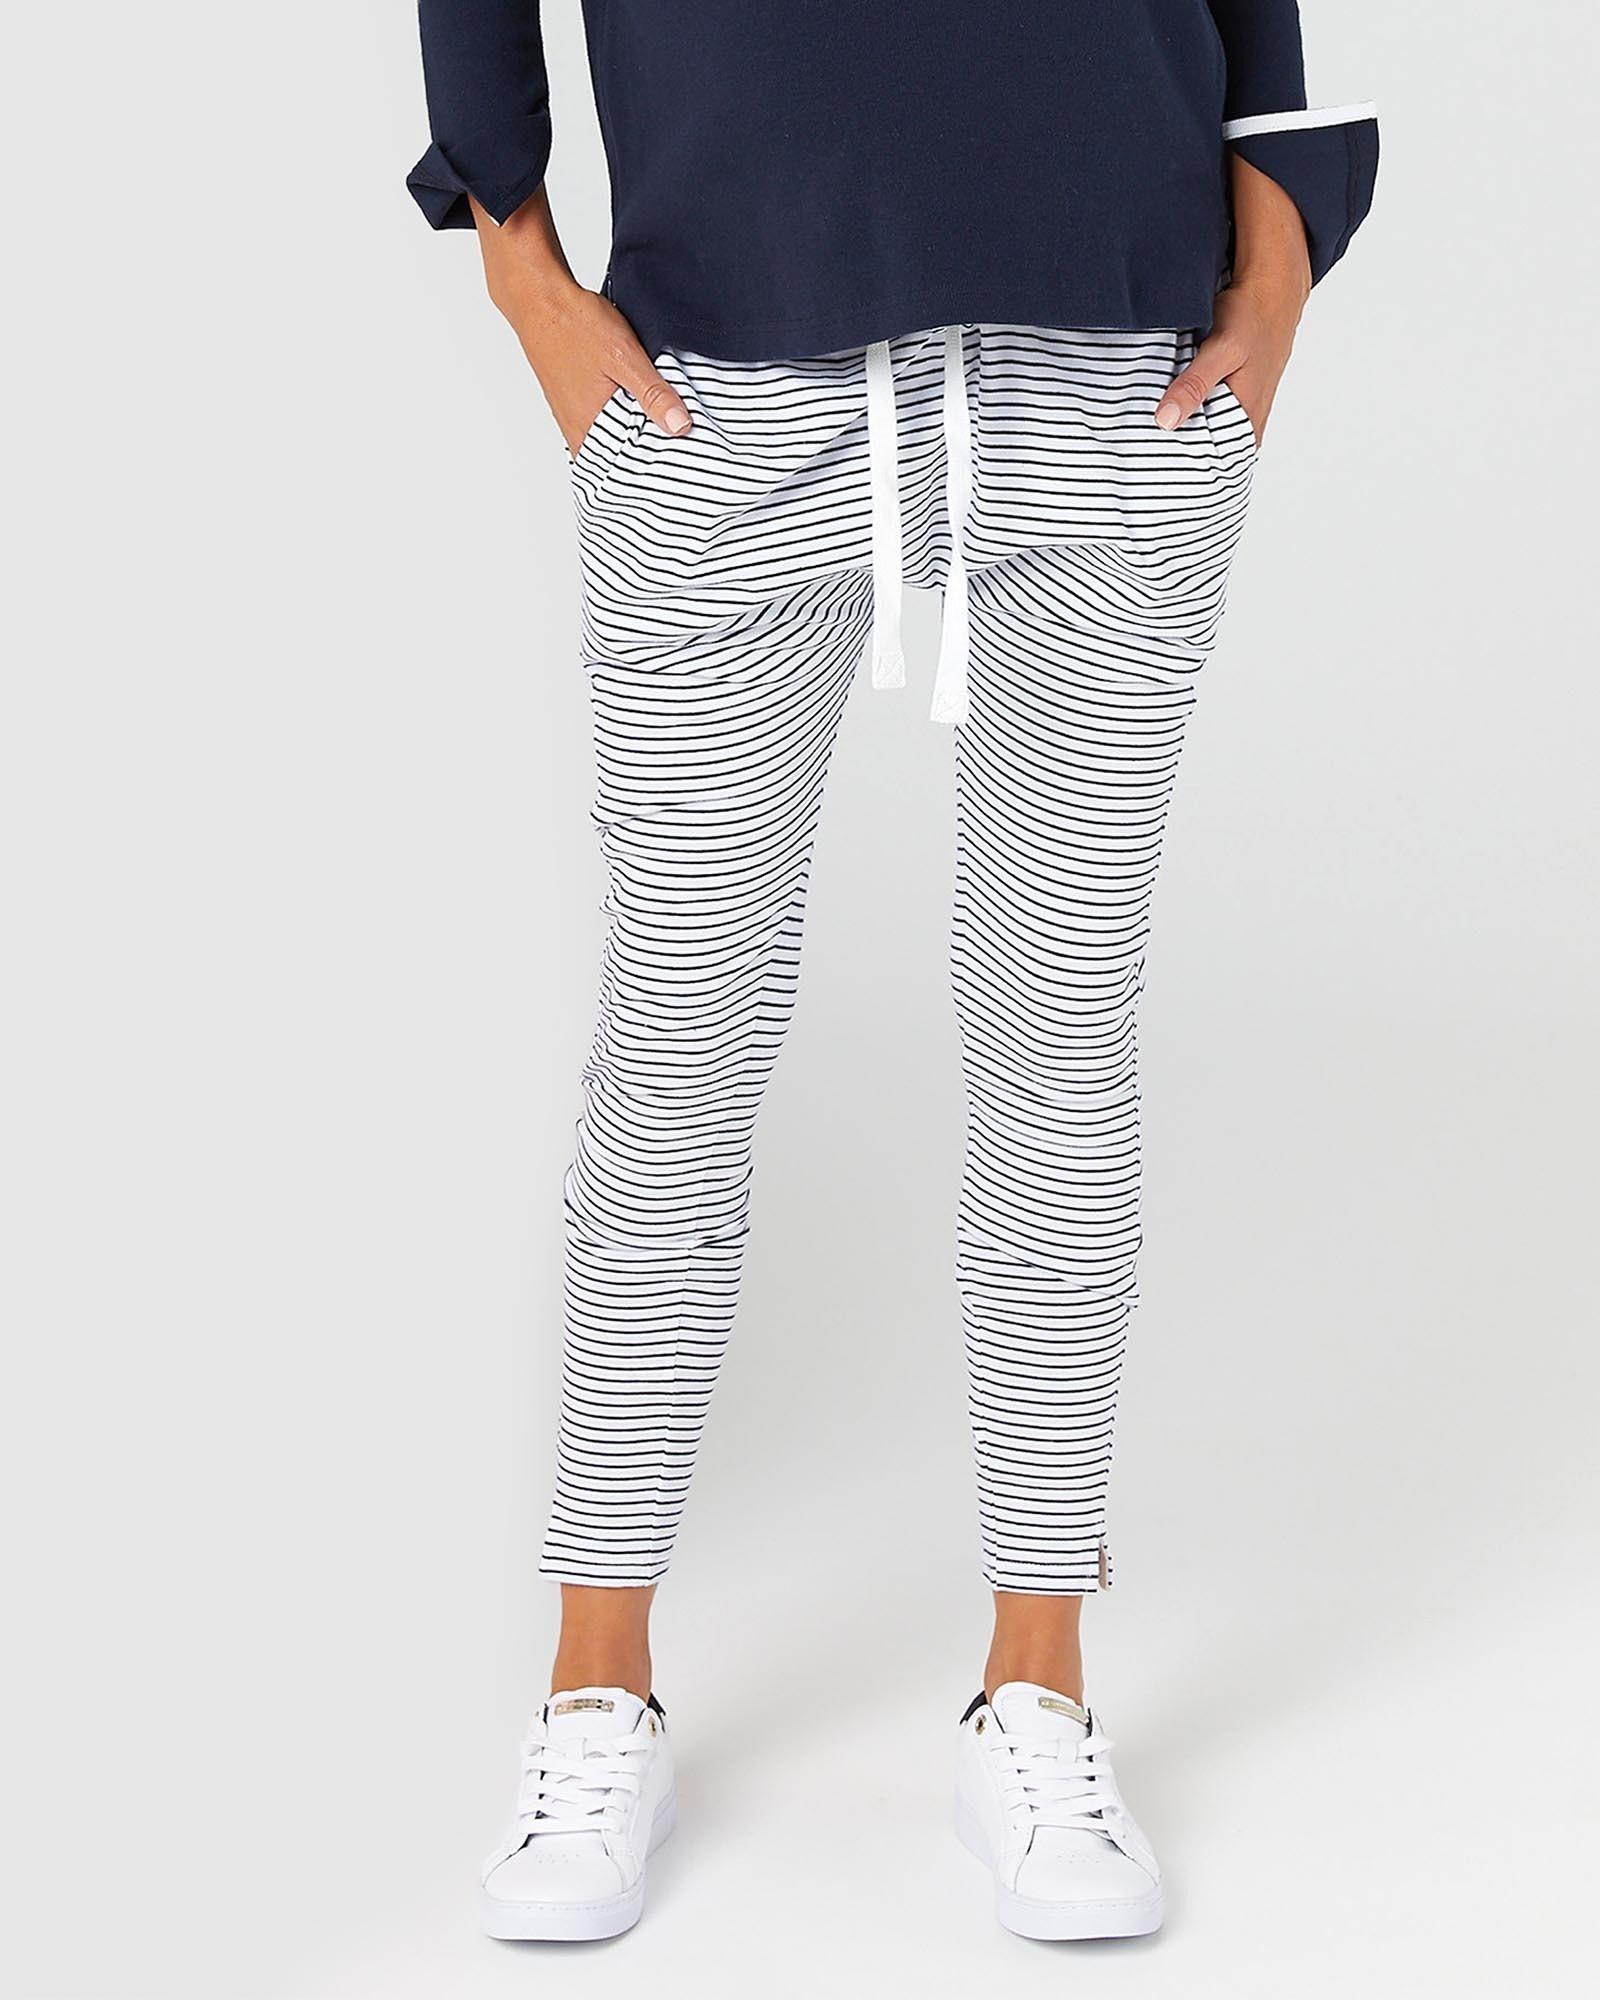 Legoe Navy Striped Lounge Pants